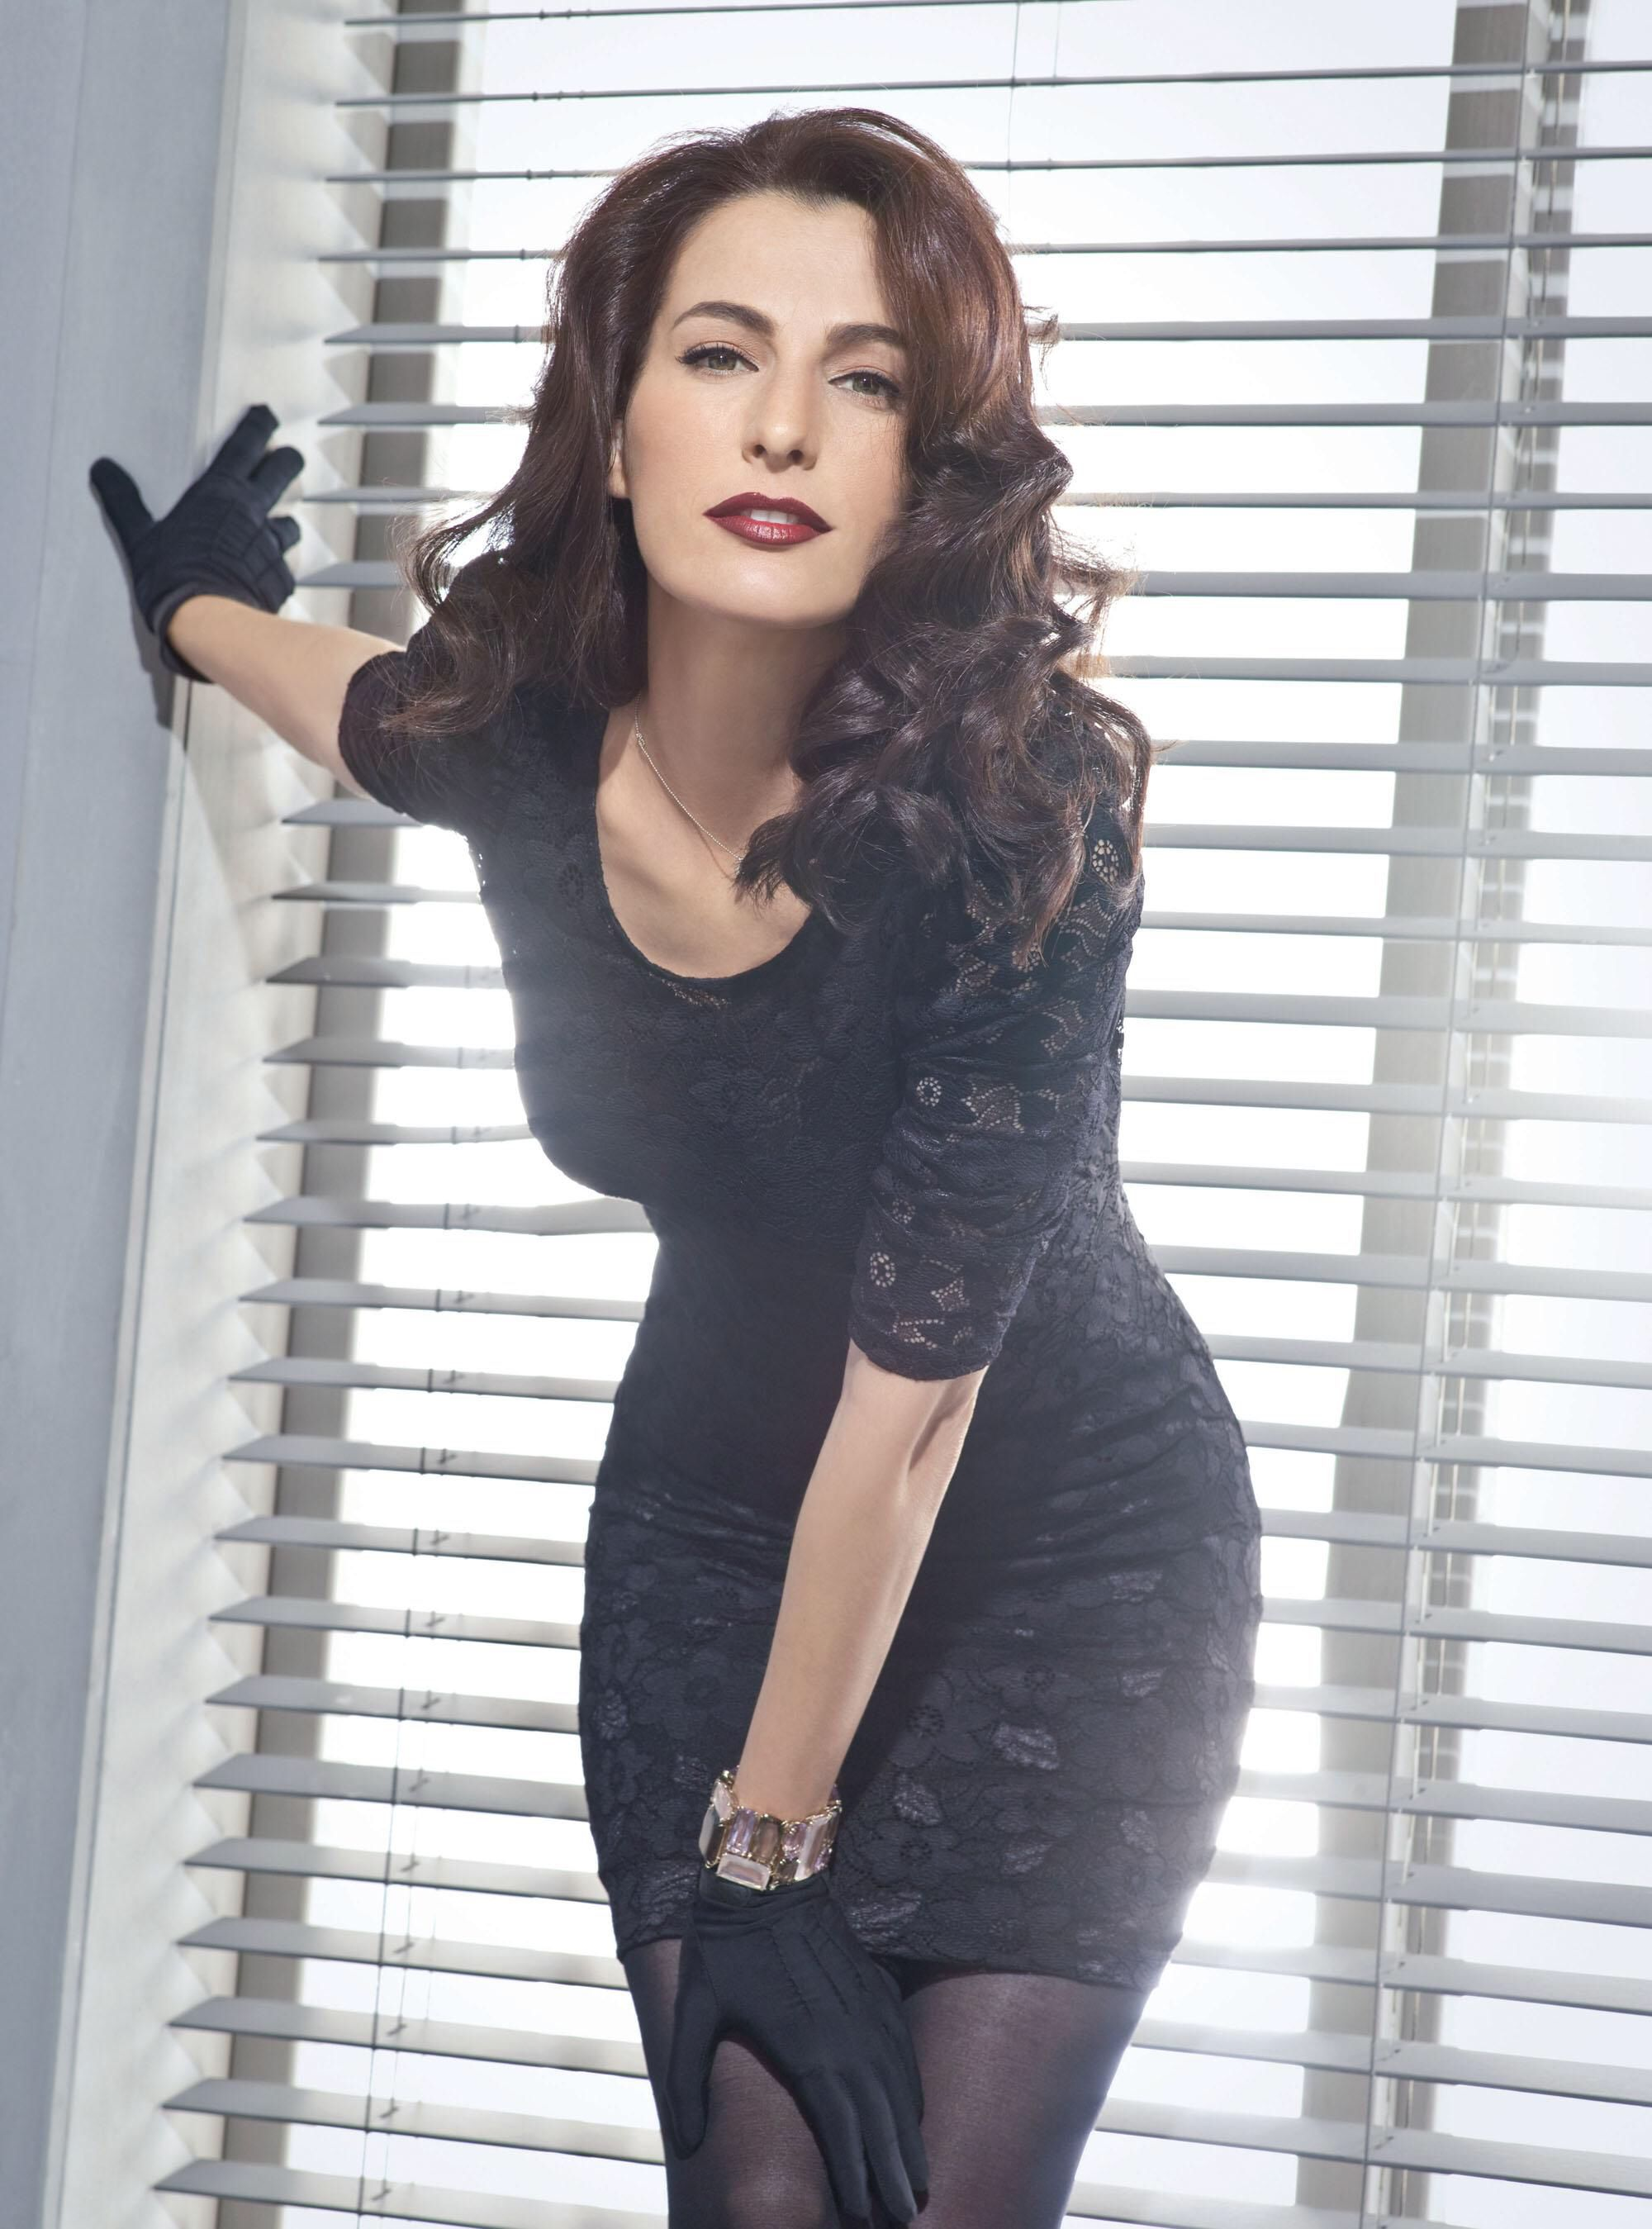 Pin by Tommy Gonzales on Modeling | Women, Celebrities